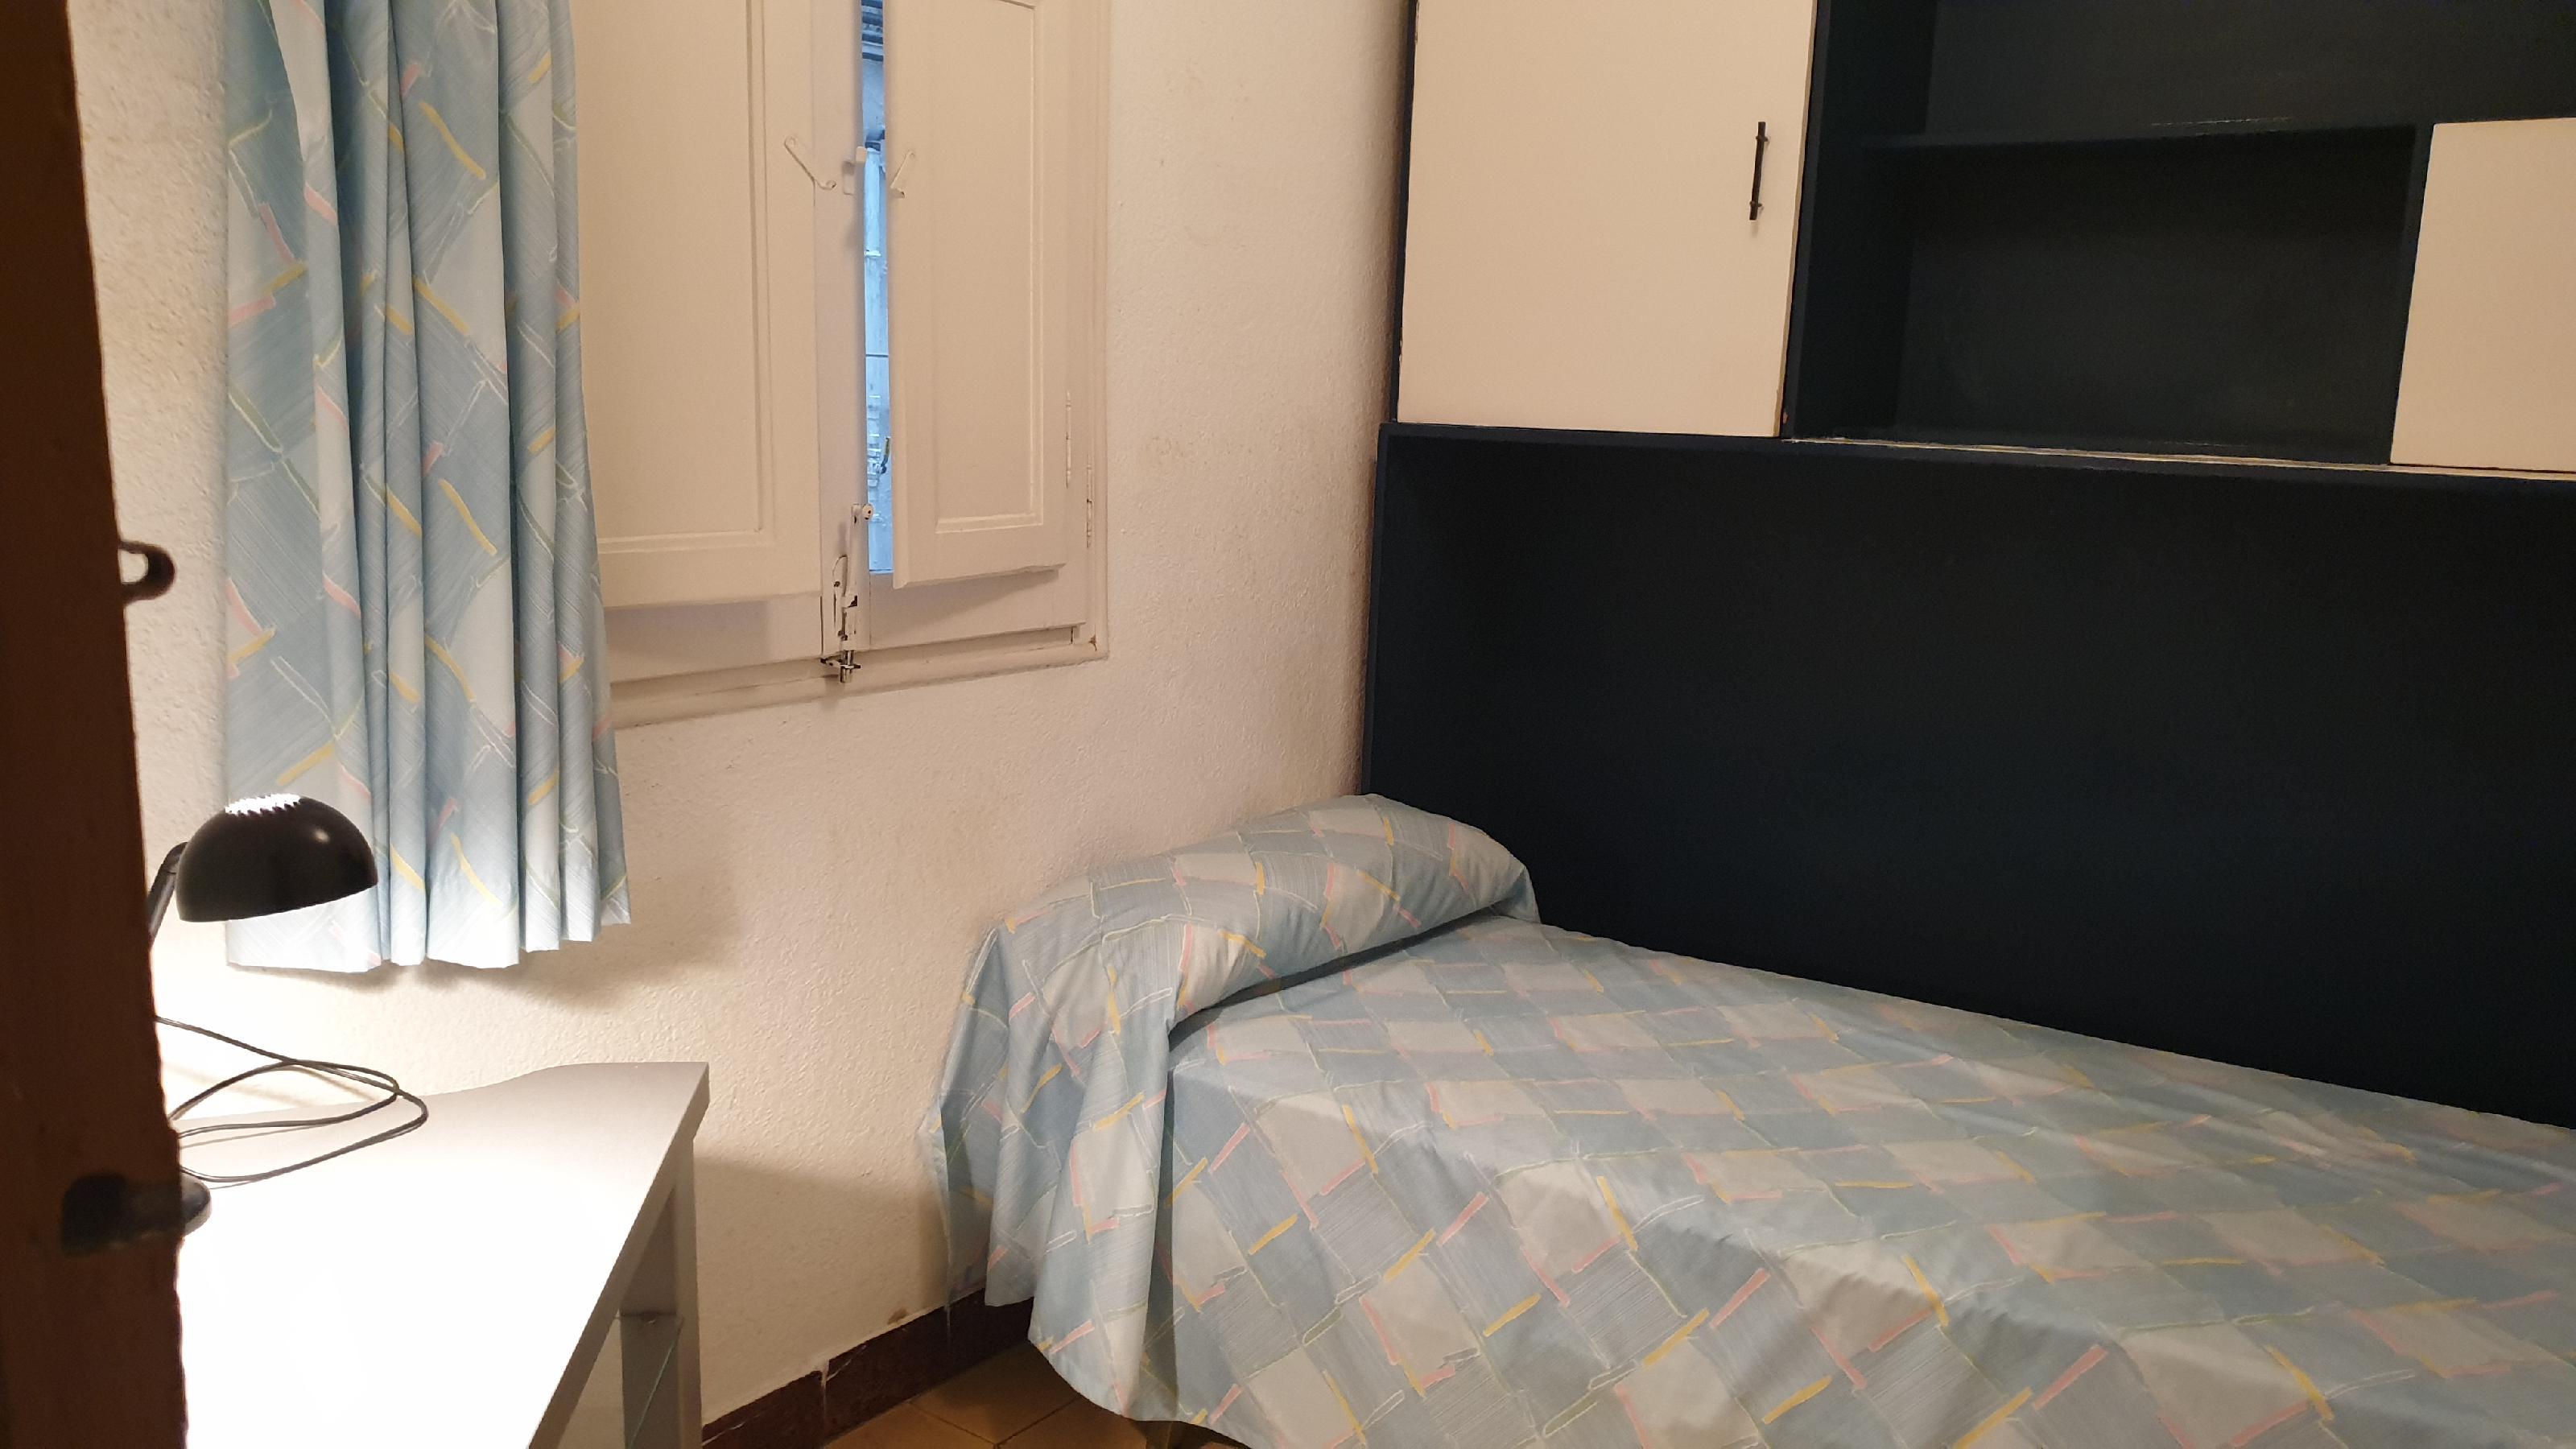 Imagen 4 Piso en venta en Hospitalet De Llobregat L´ / Junto al mercado de Collblanc.